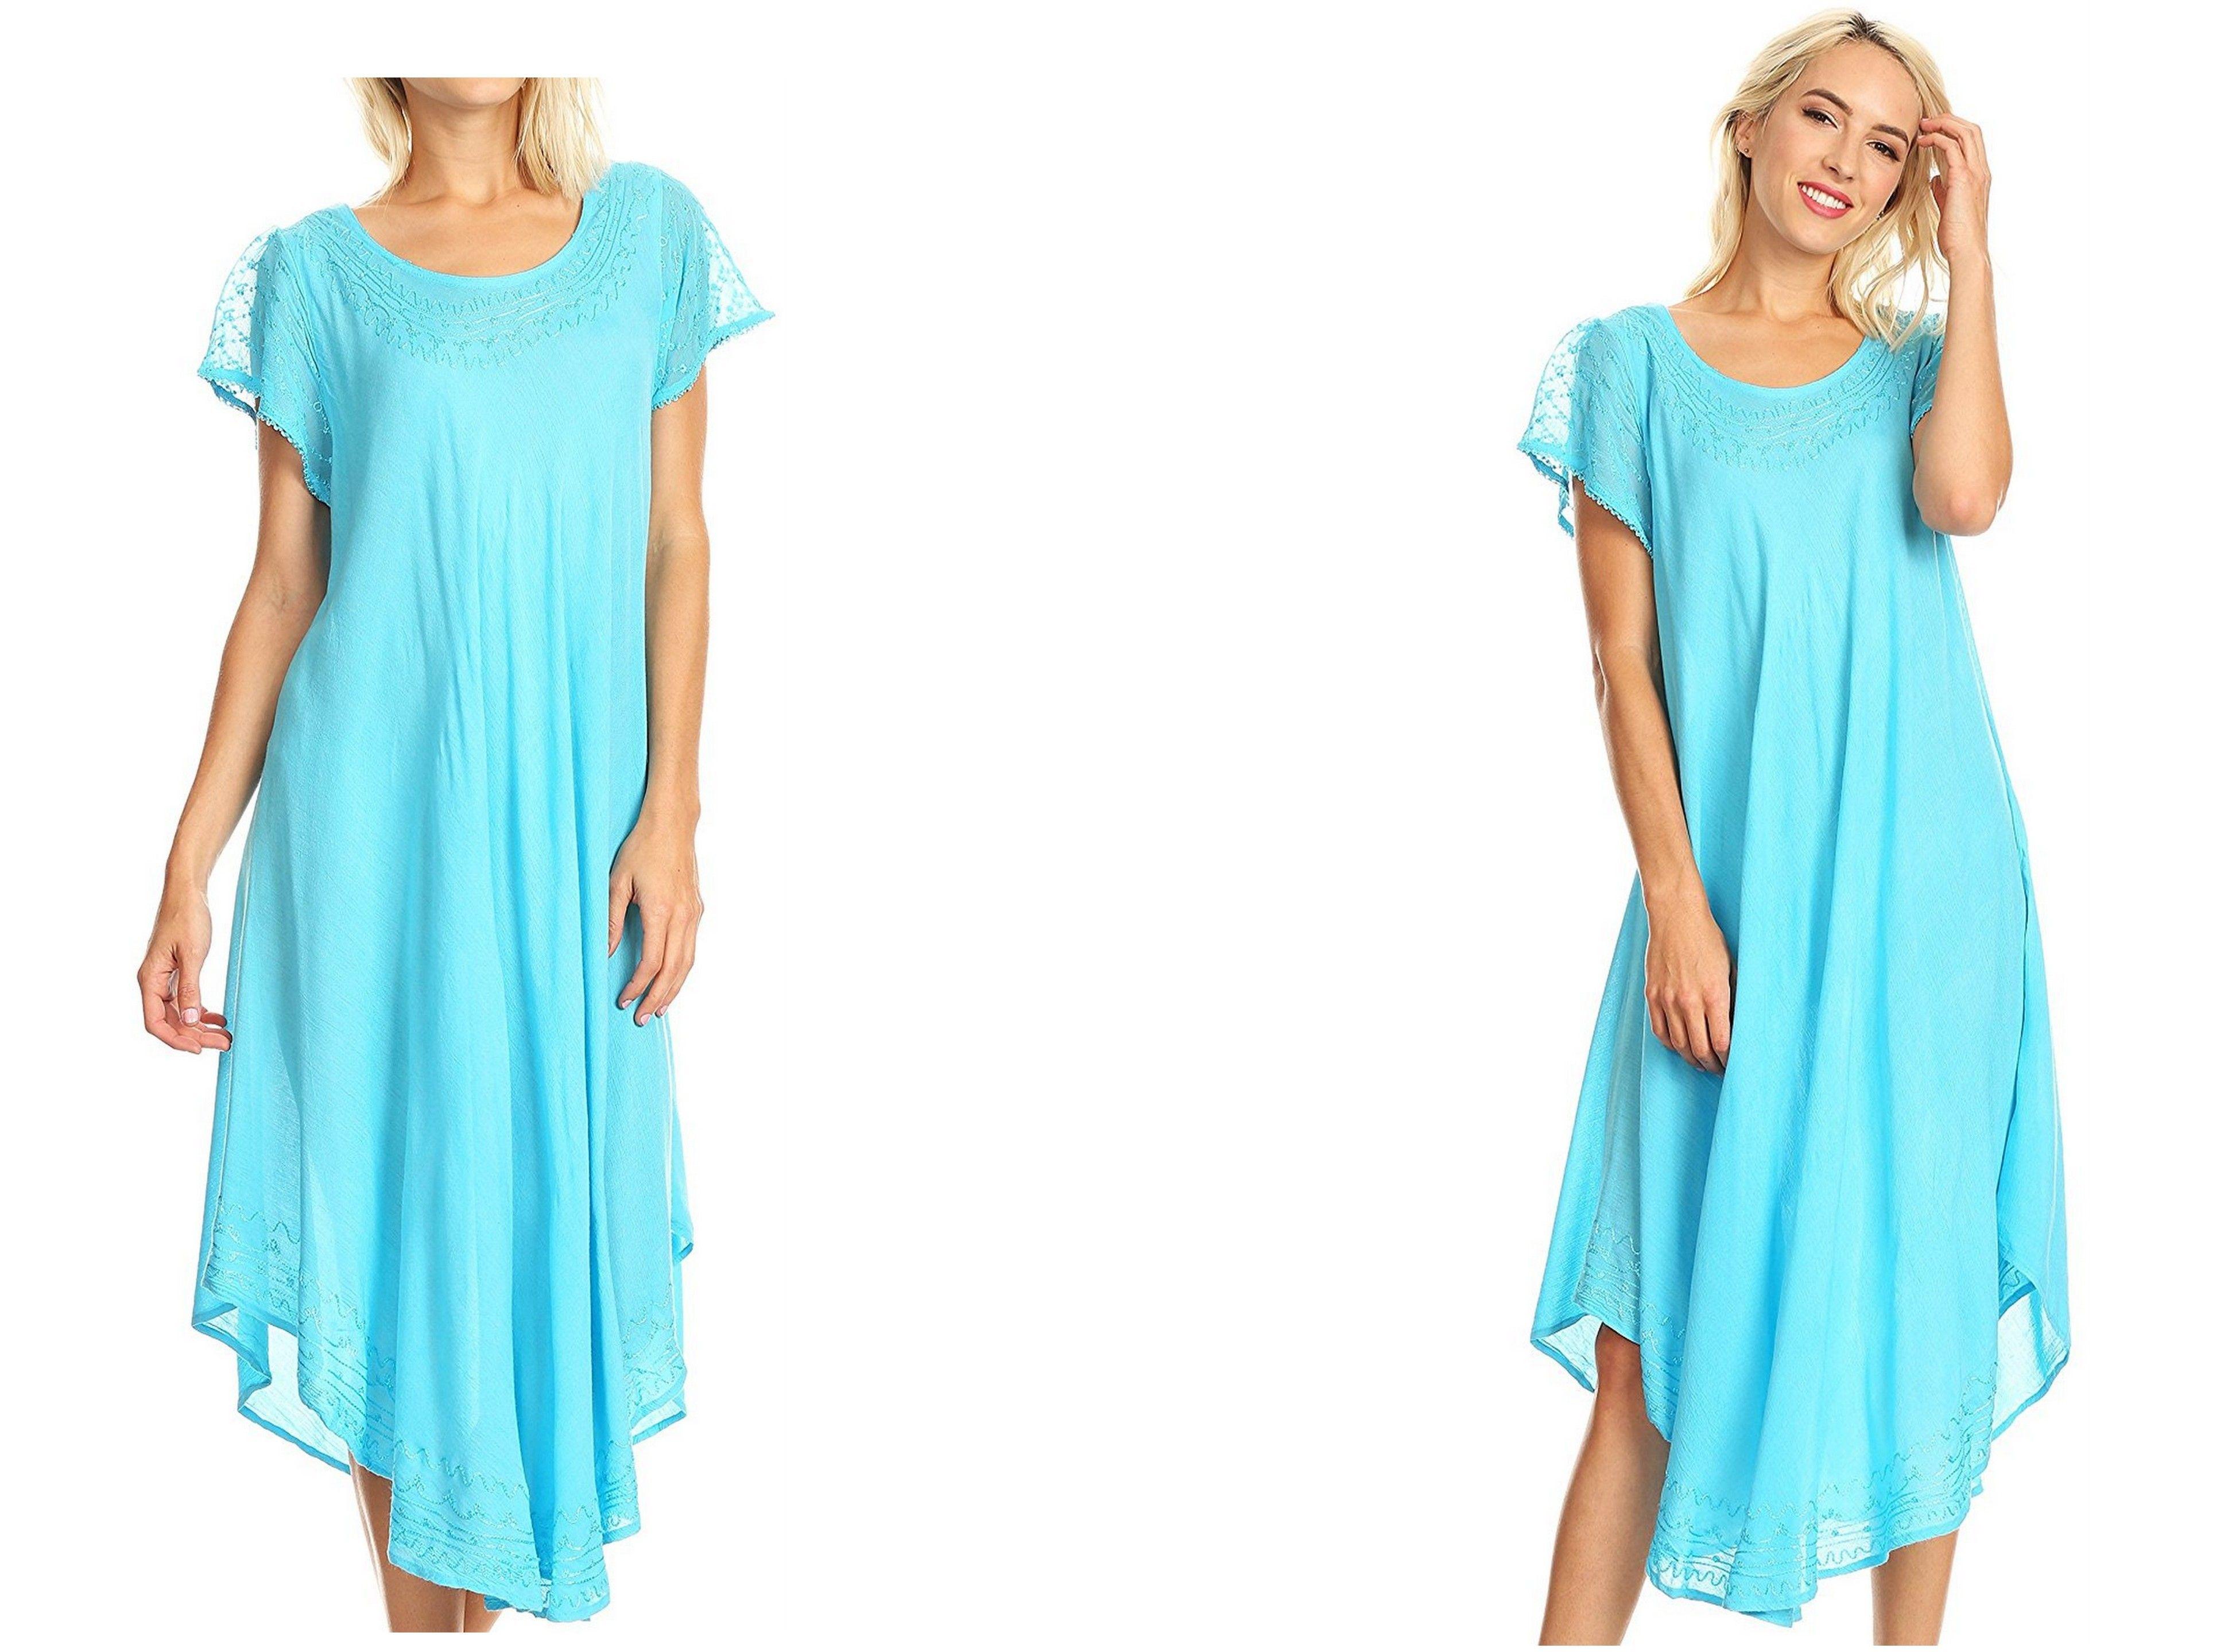 bc47428df1 Sakkas Everyday Essentials Cap Sleeve Caftan Dress / Cover Up ...